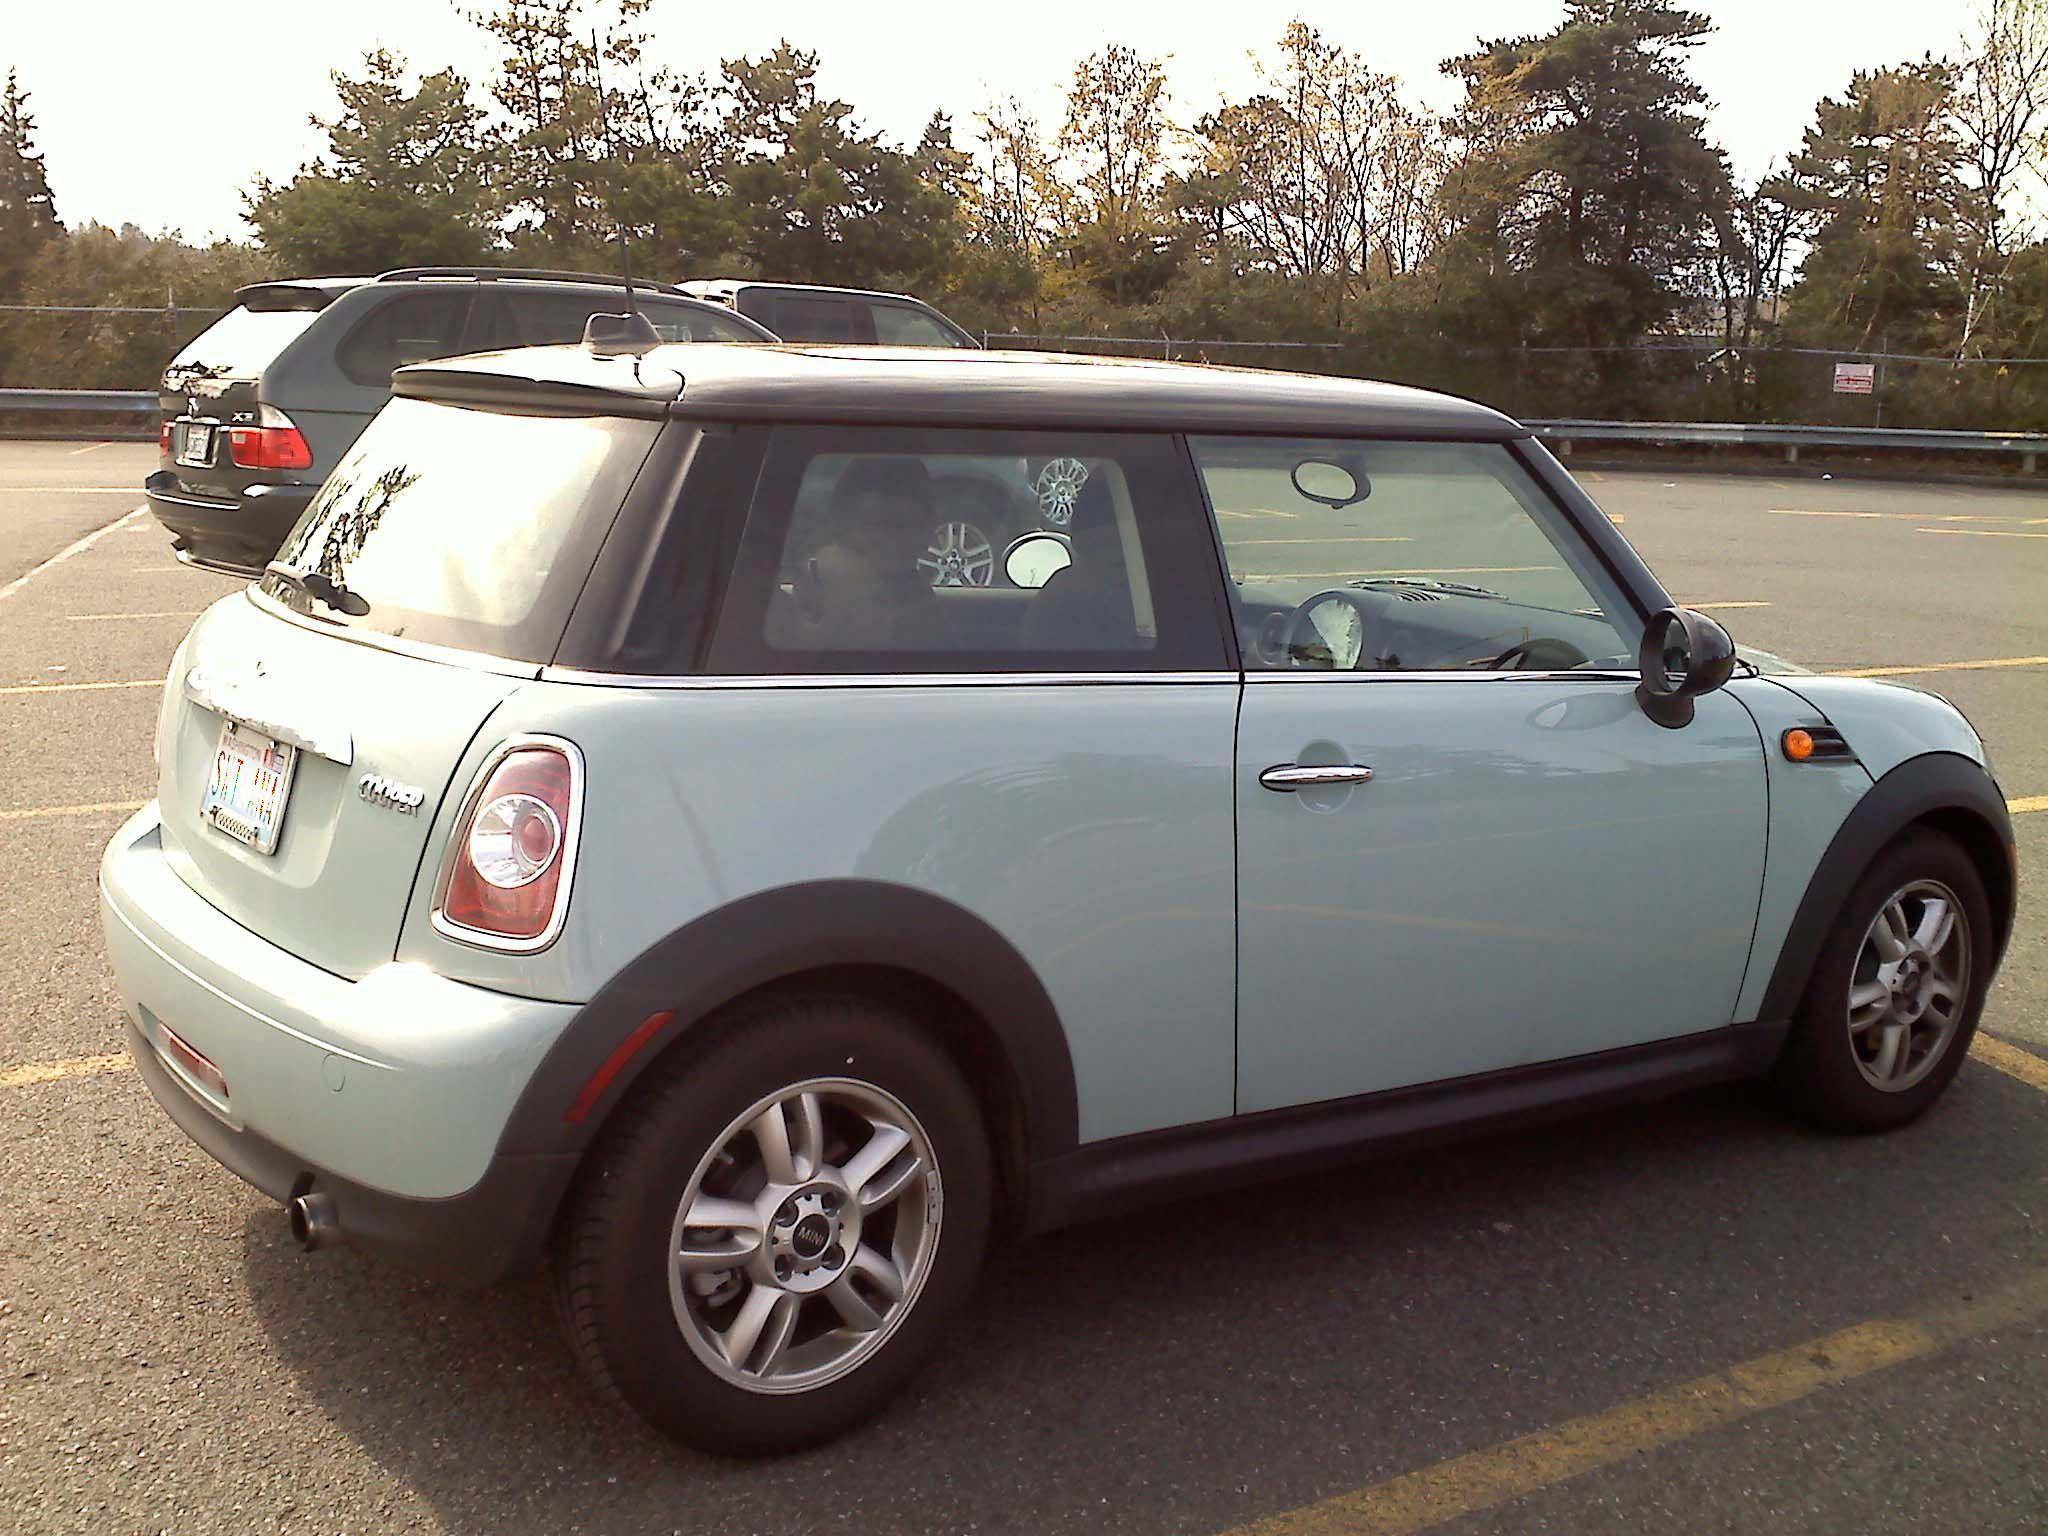 Deam Car : Tiffany Blue Mini Cooper <3